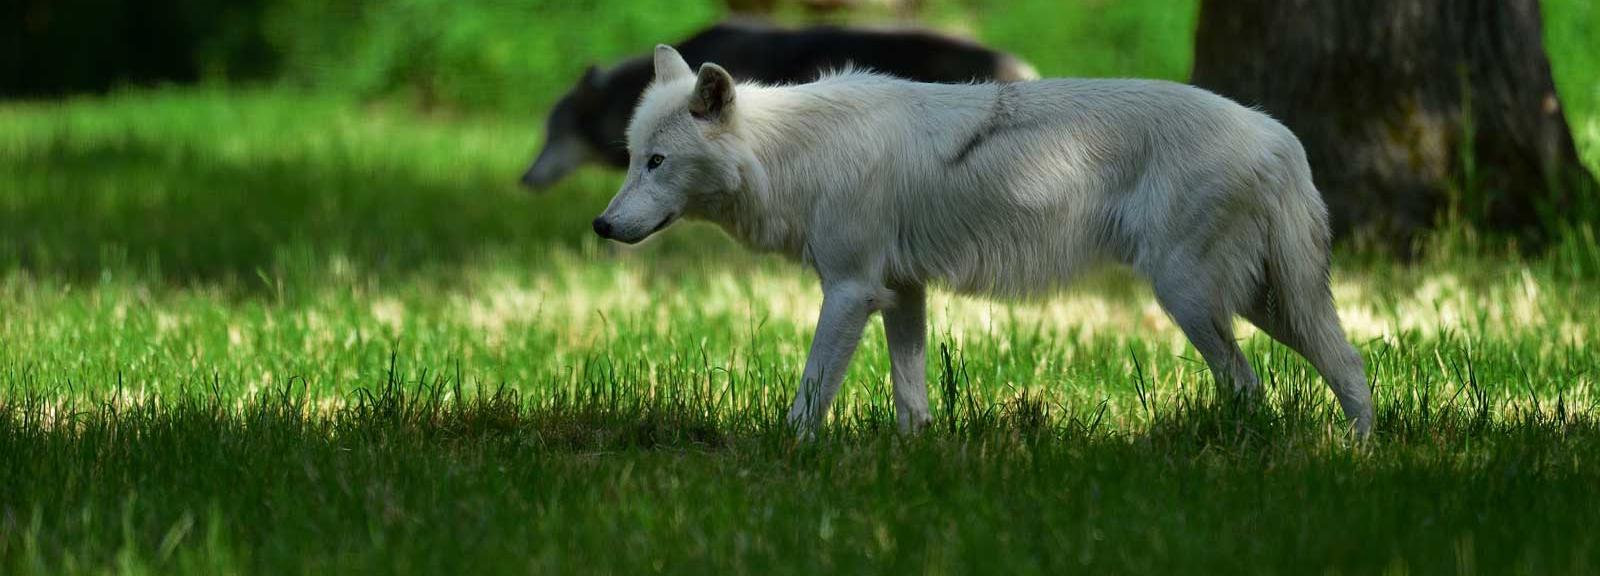 Loups de Mackenzie © MNHN - F-G Grandin